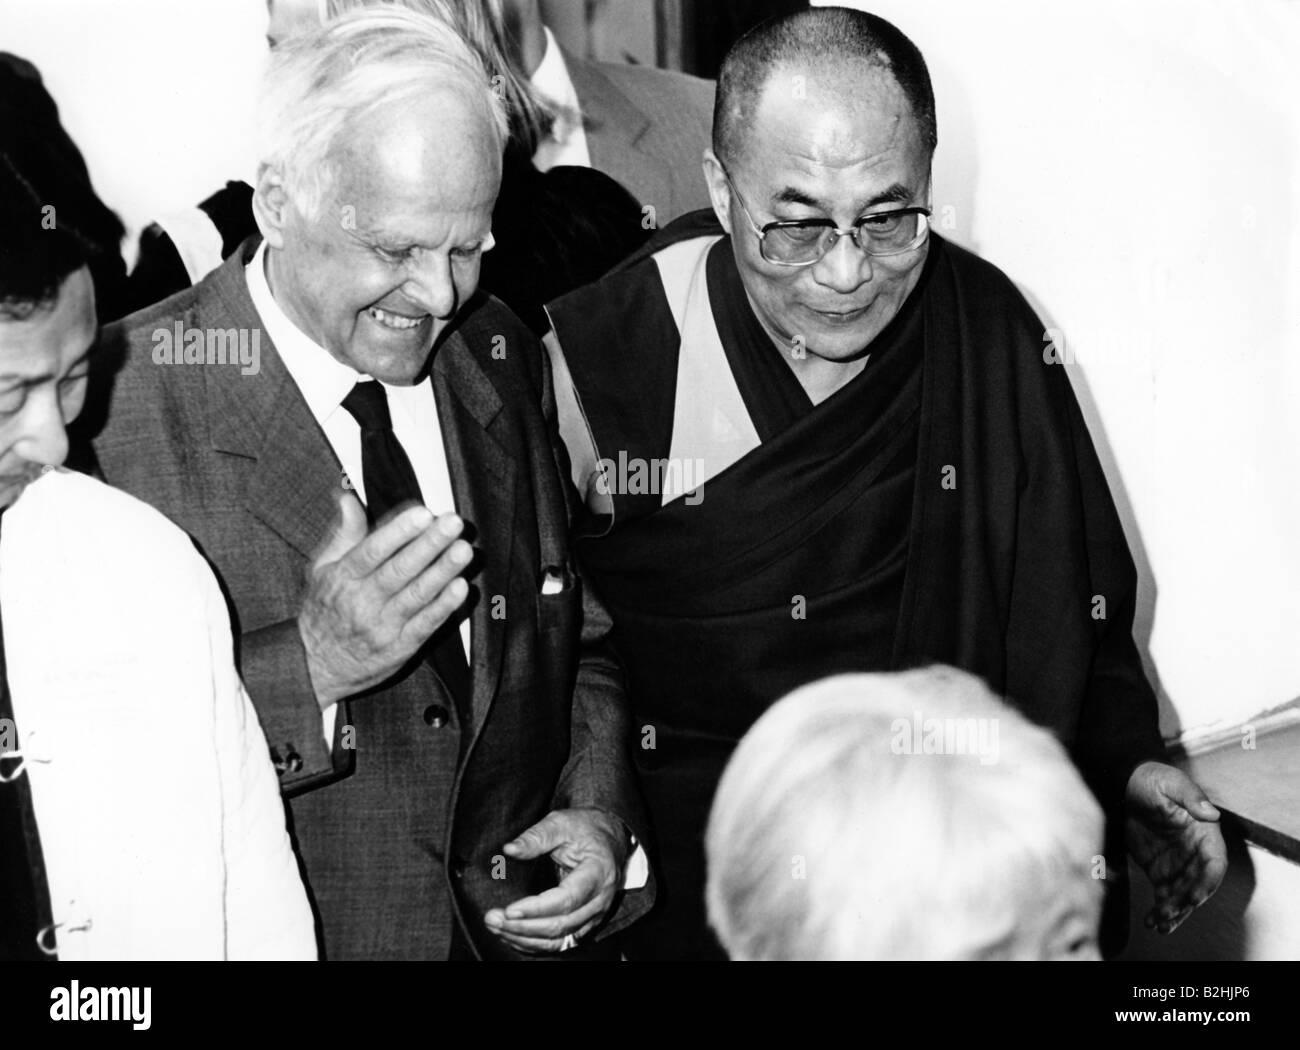 Dalai Lama 14th (Tenzin Gyatso), * 6.7.1935, Tibetan lama and politician, half length, with Carl Friedrich von Weizsäcker, - Stock Image